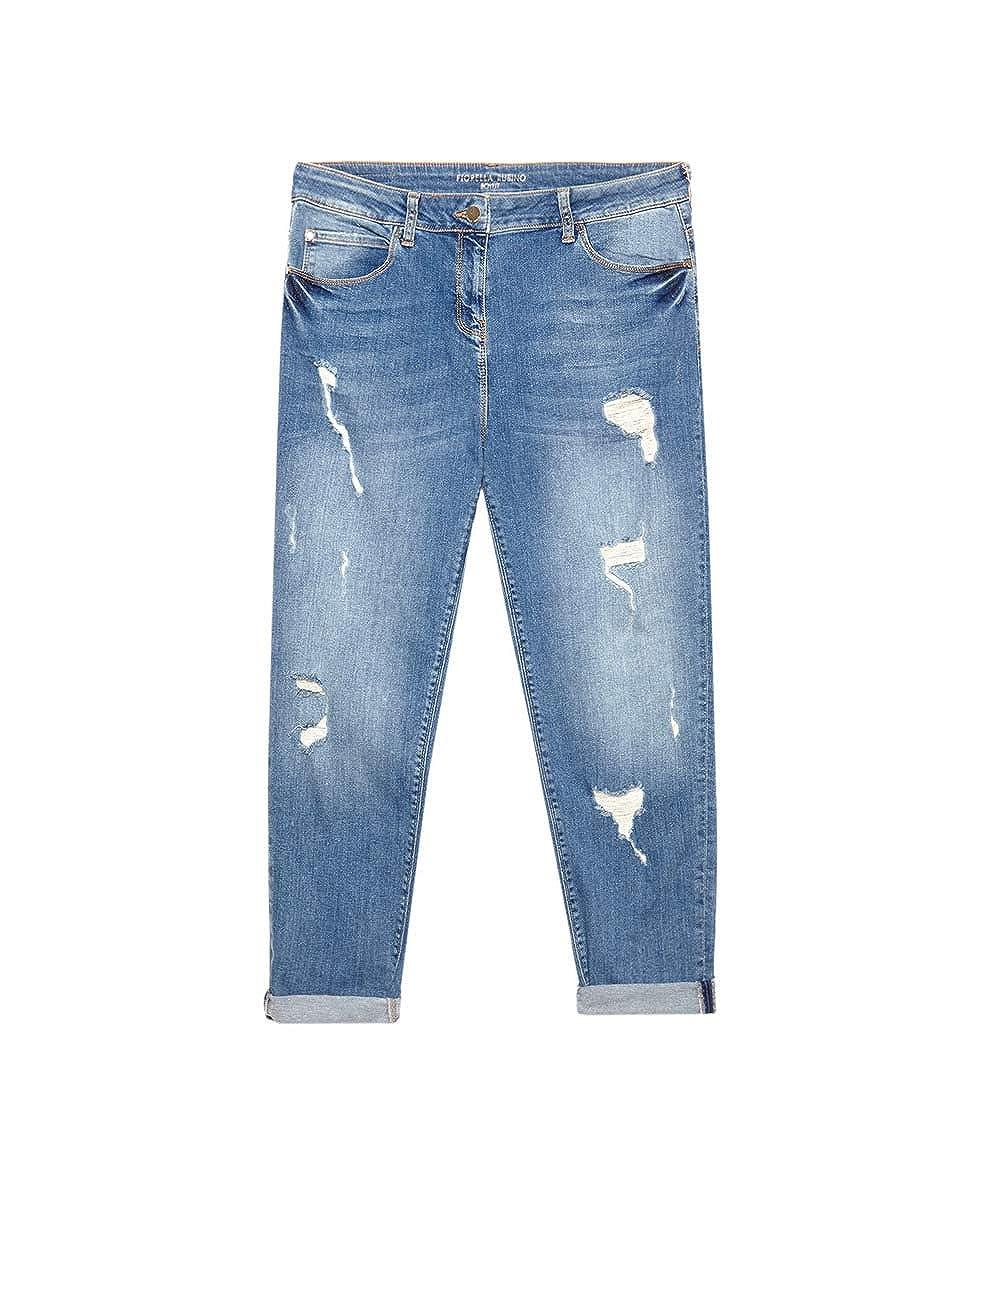 Fiorella Rubino Jeans boyfit Destroyed Italian Plus Size